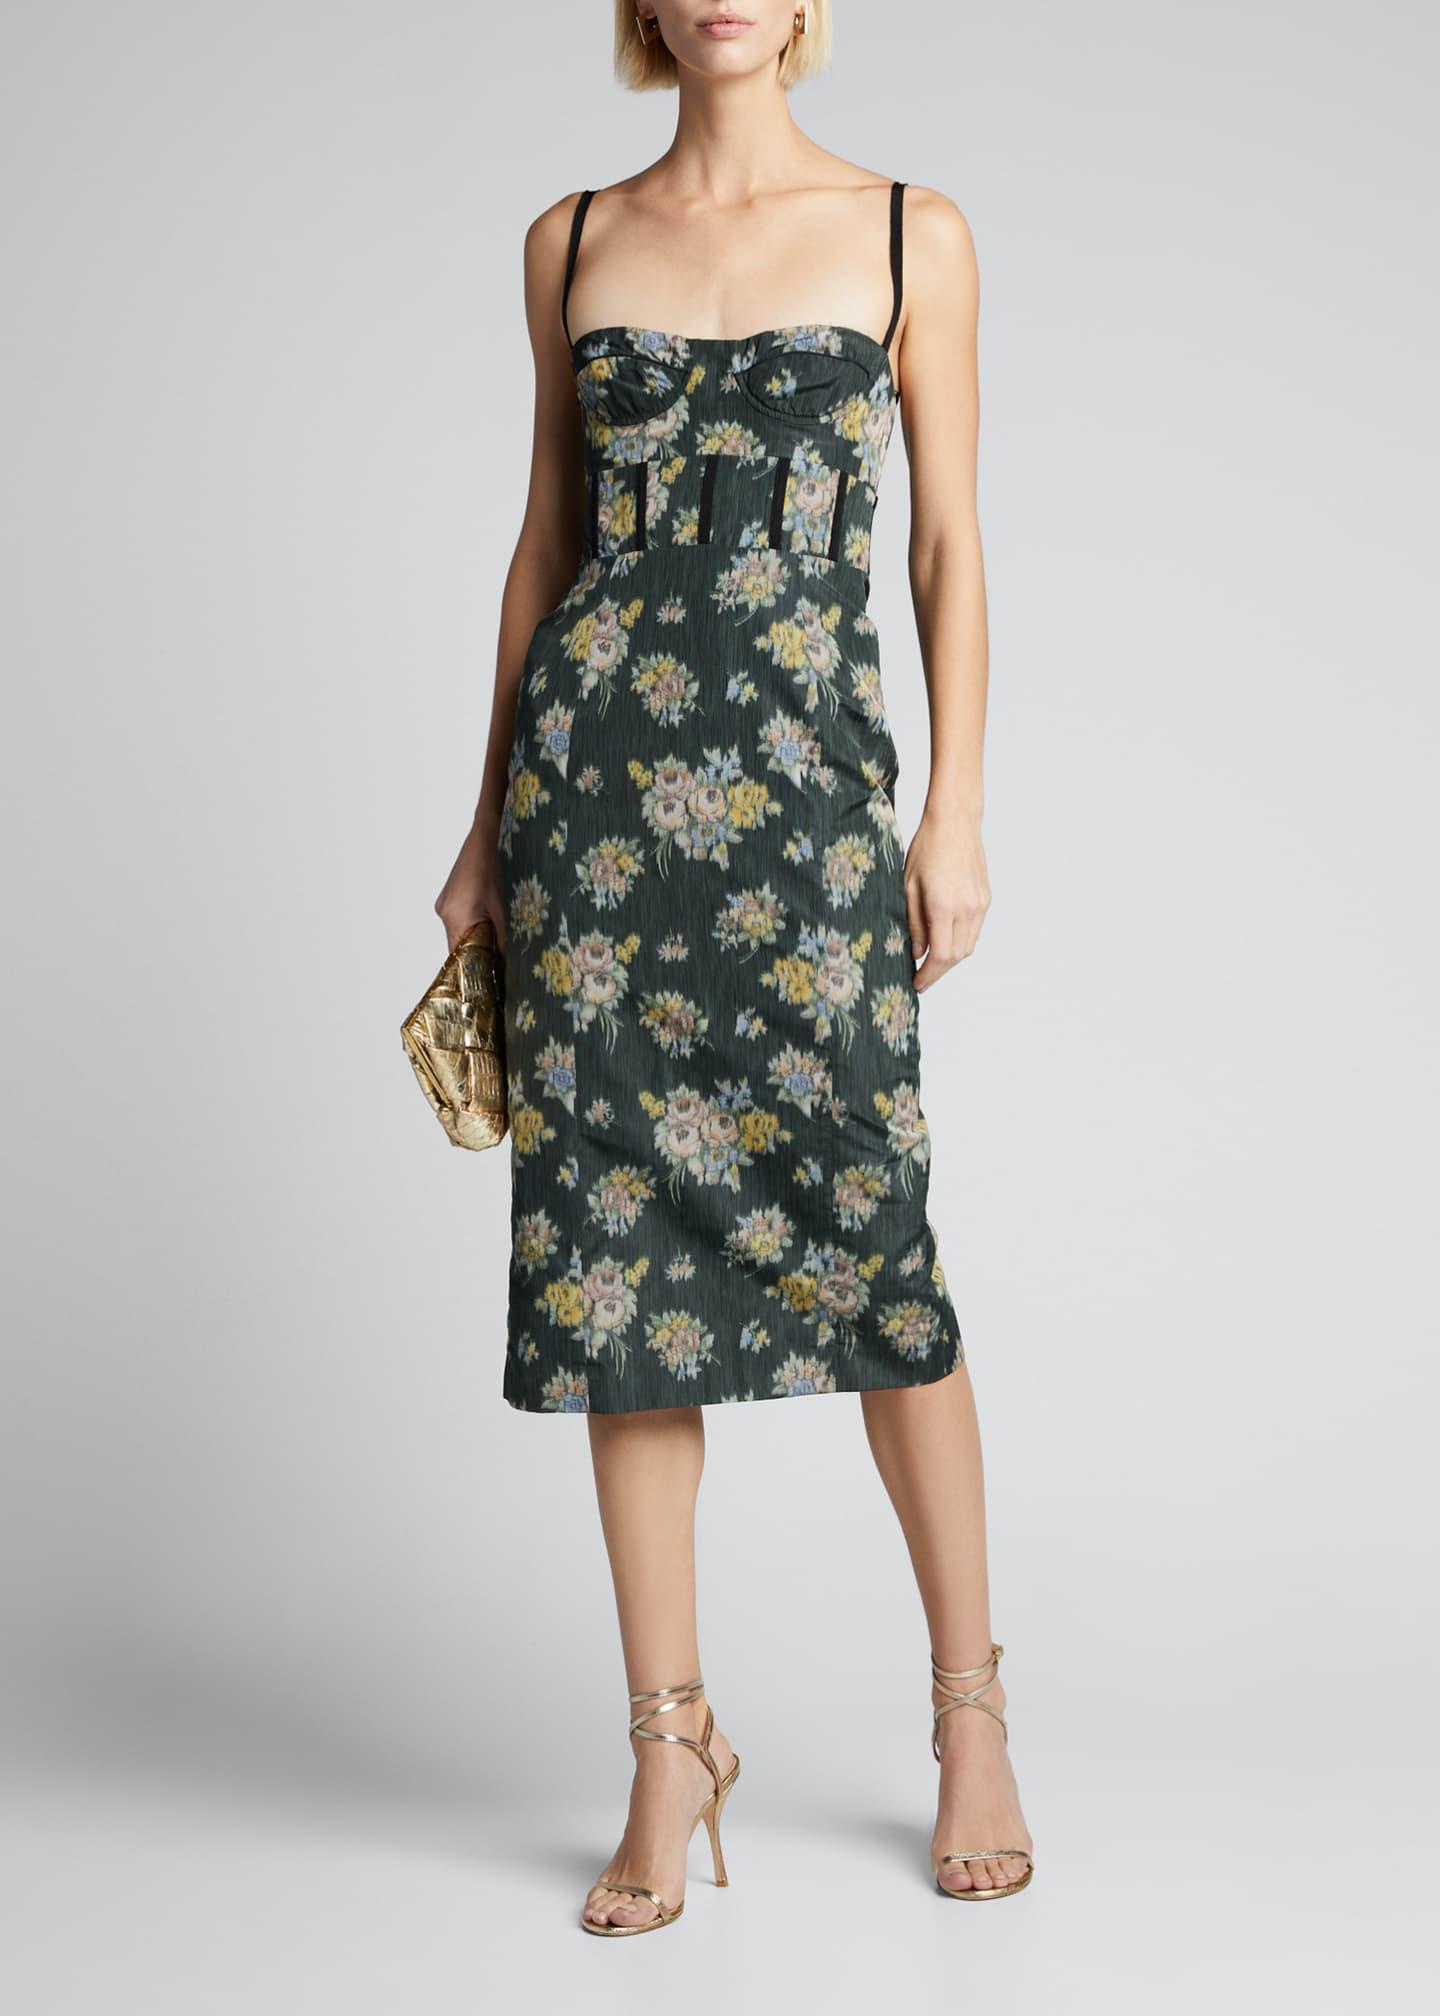 Brock Collection Floral-Print Balconette Dress